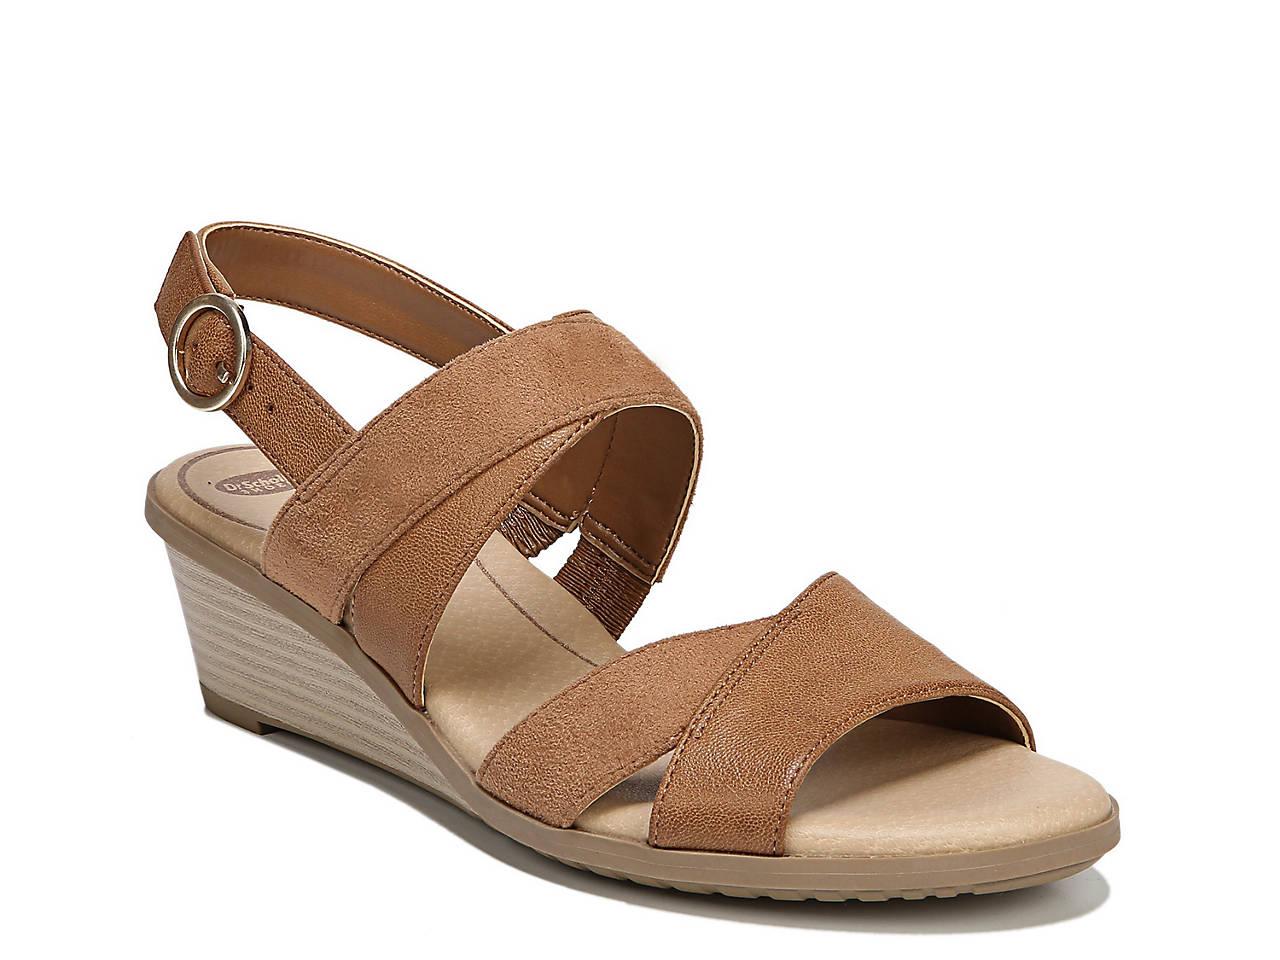 Dr. Scholl's Day Trip Sandals Women's Shoes q2FzQrPVw